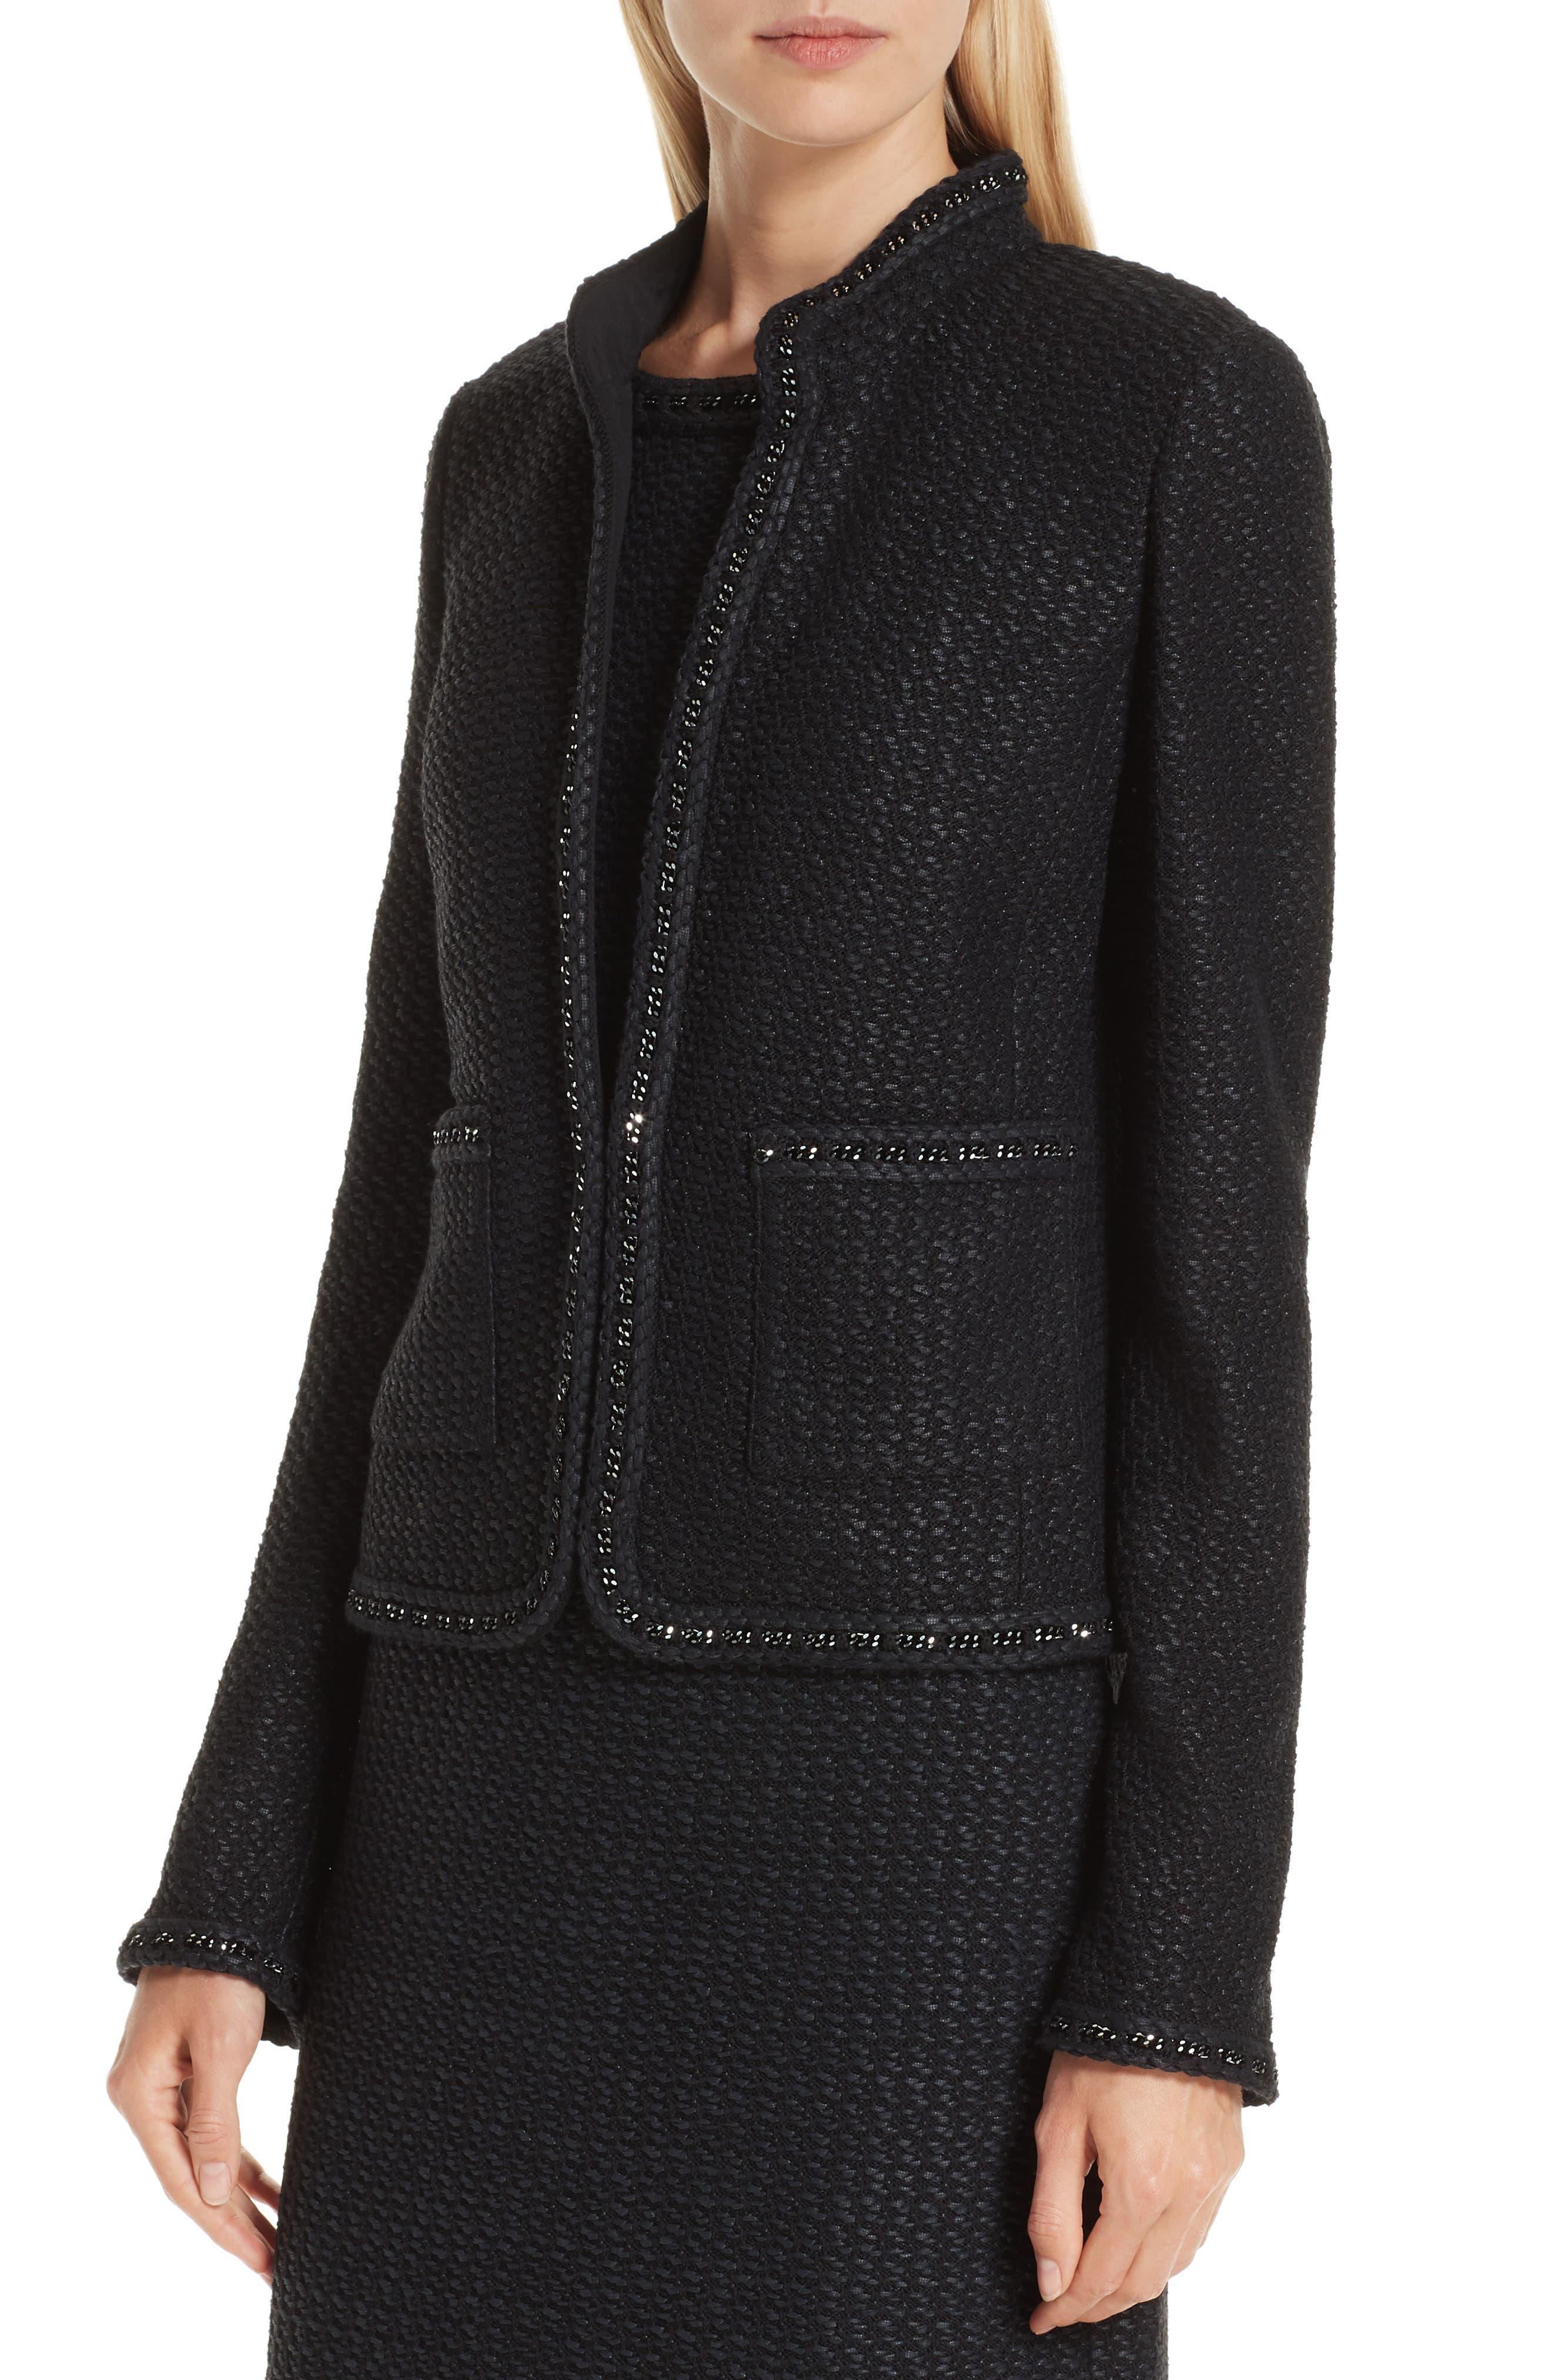 ST. JOHN COLLECTION, Adina Knit Short Jacket, Alternate thumbnail 5, color, CAVIAR